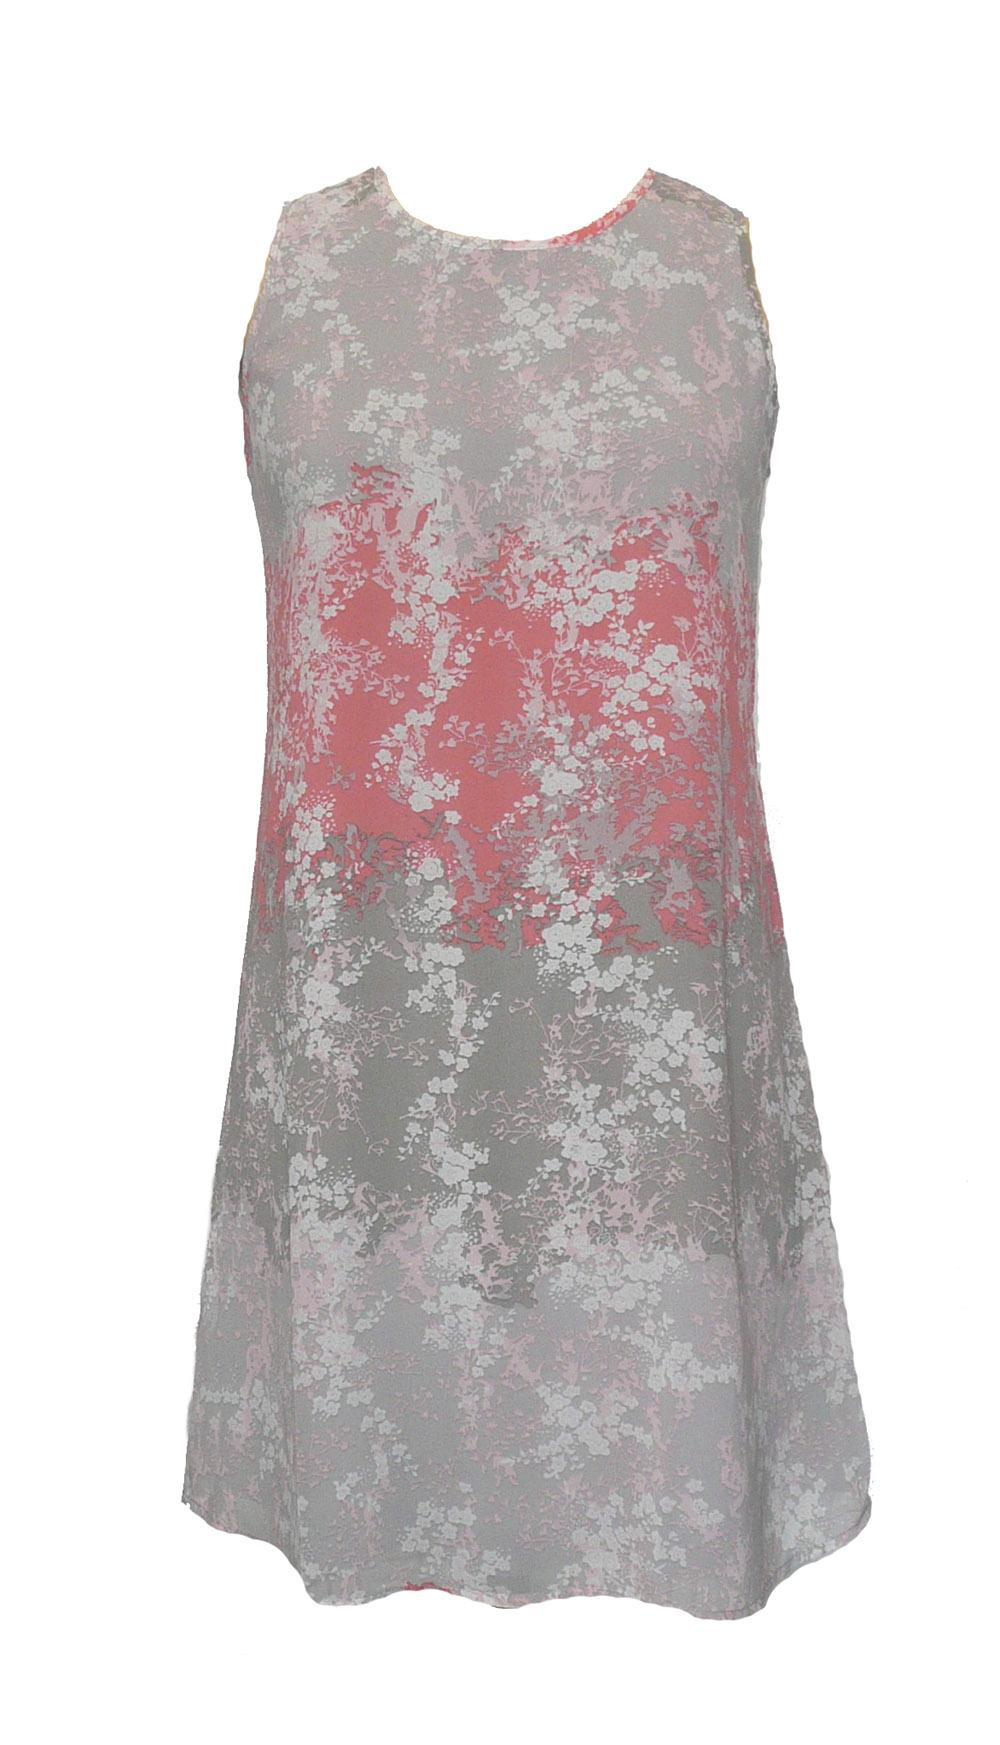 dress gry coral a line.jpg